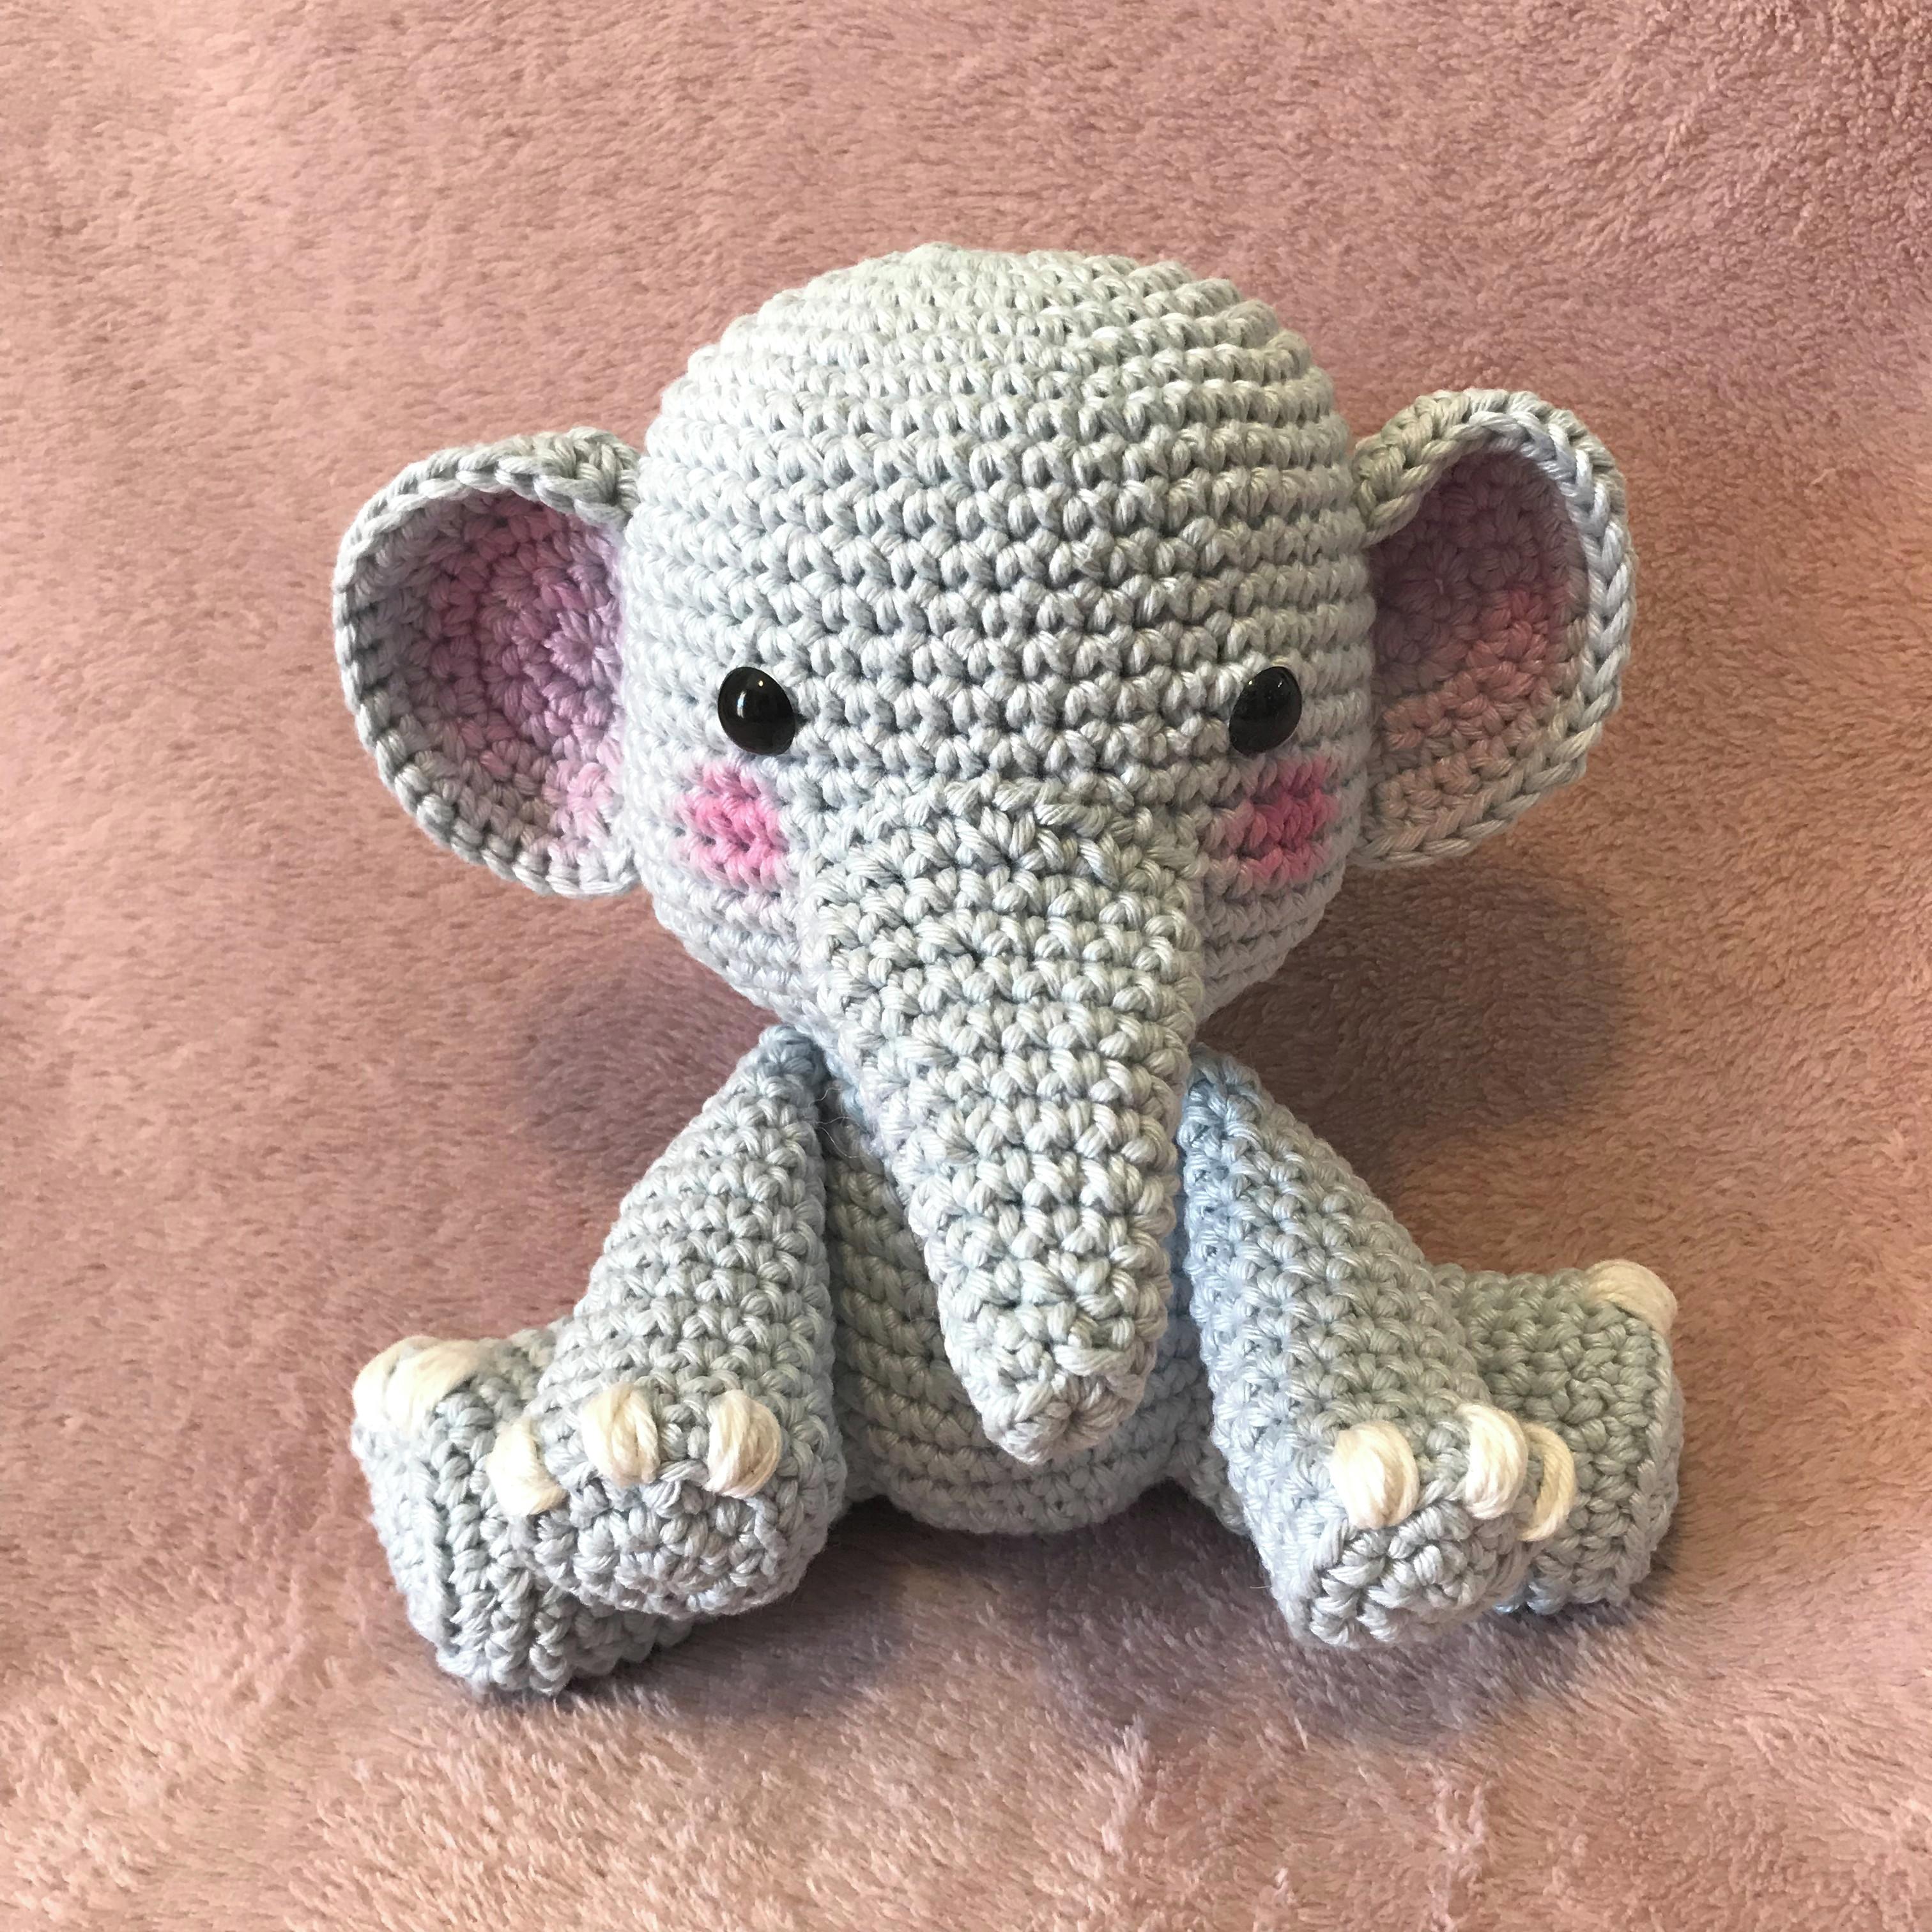 Little elephant crochet tutorial - YouTube | 3024x3024